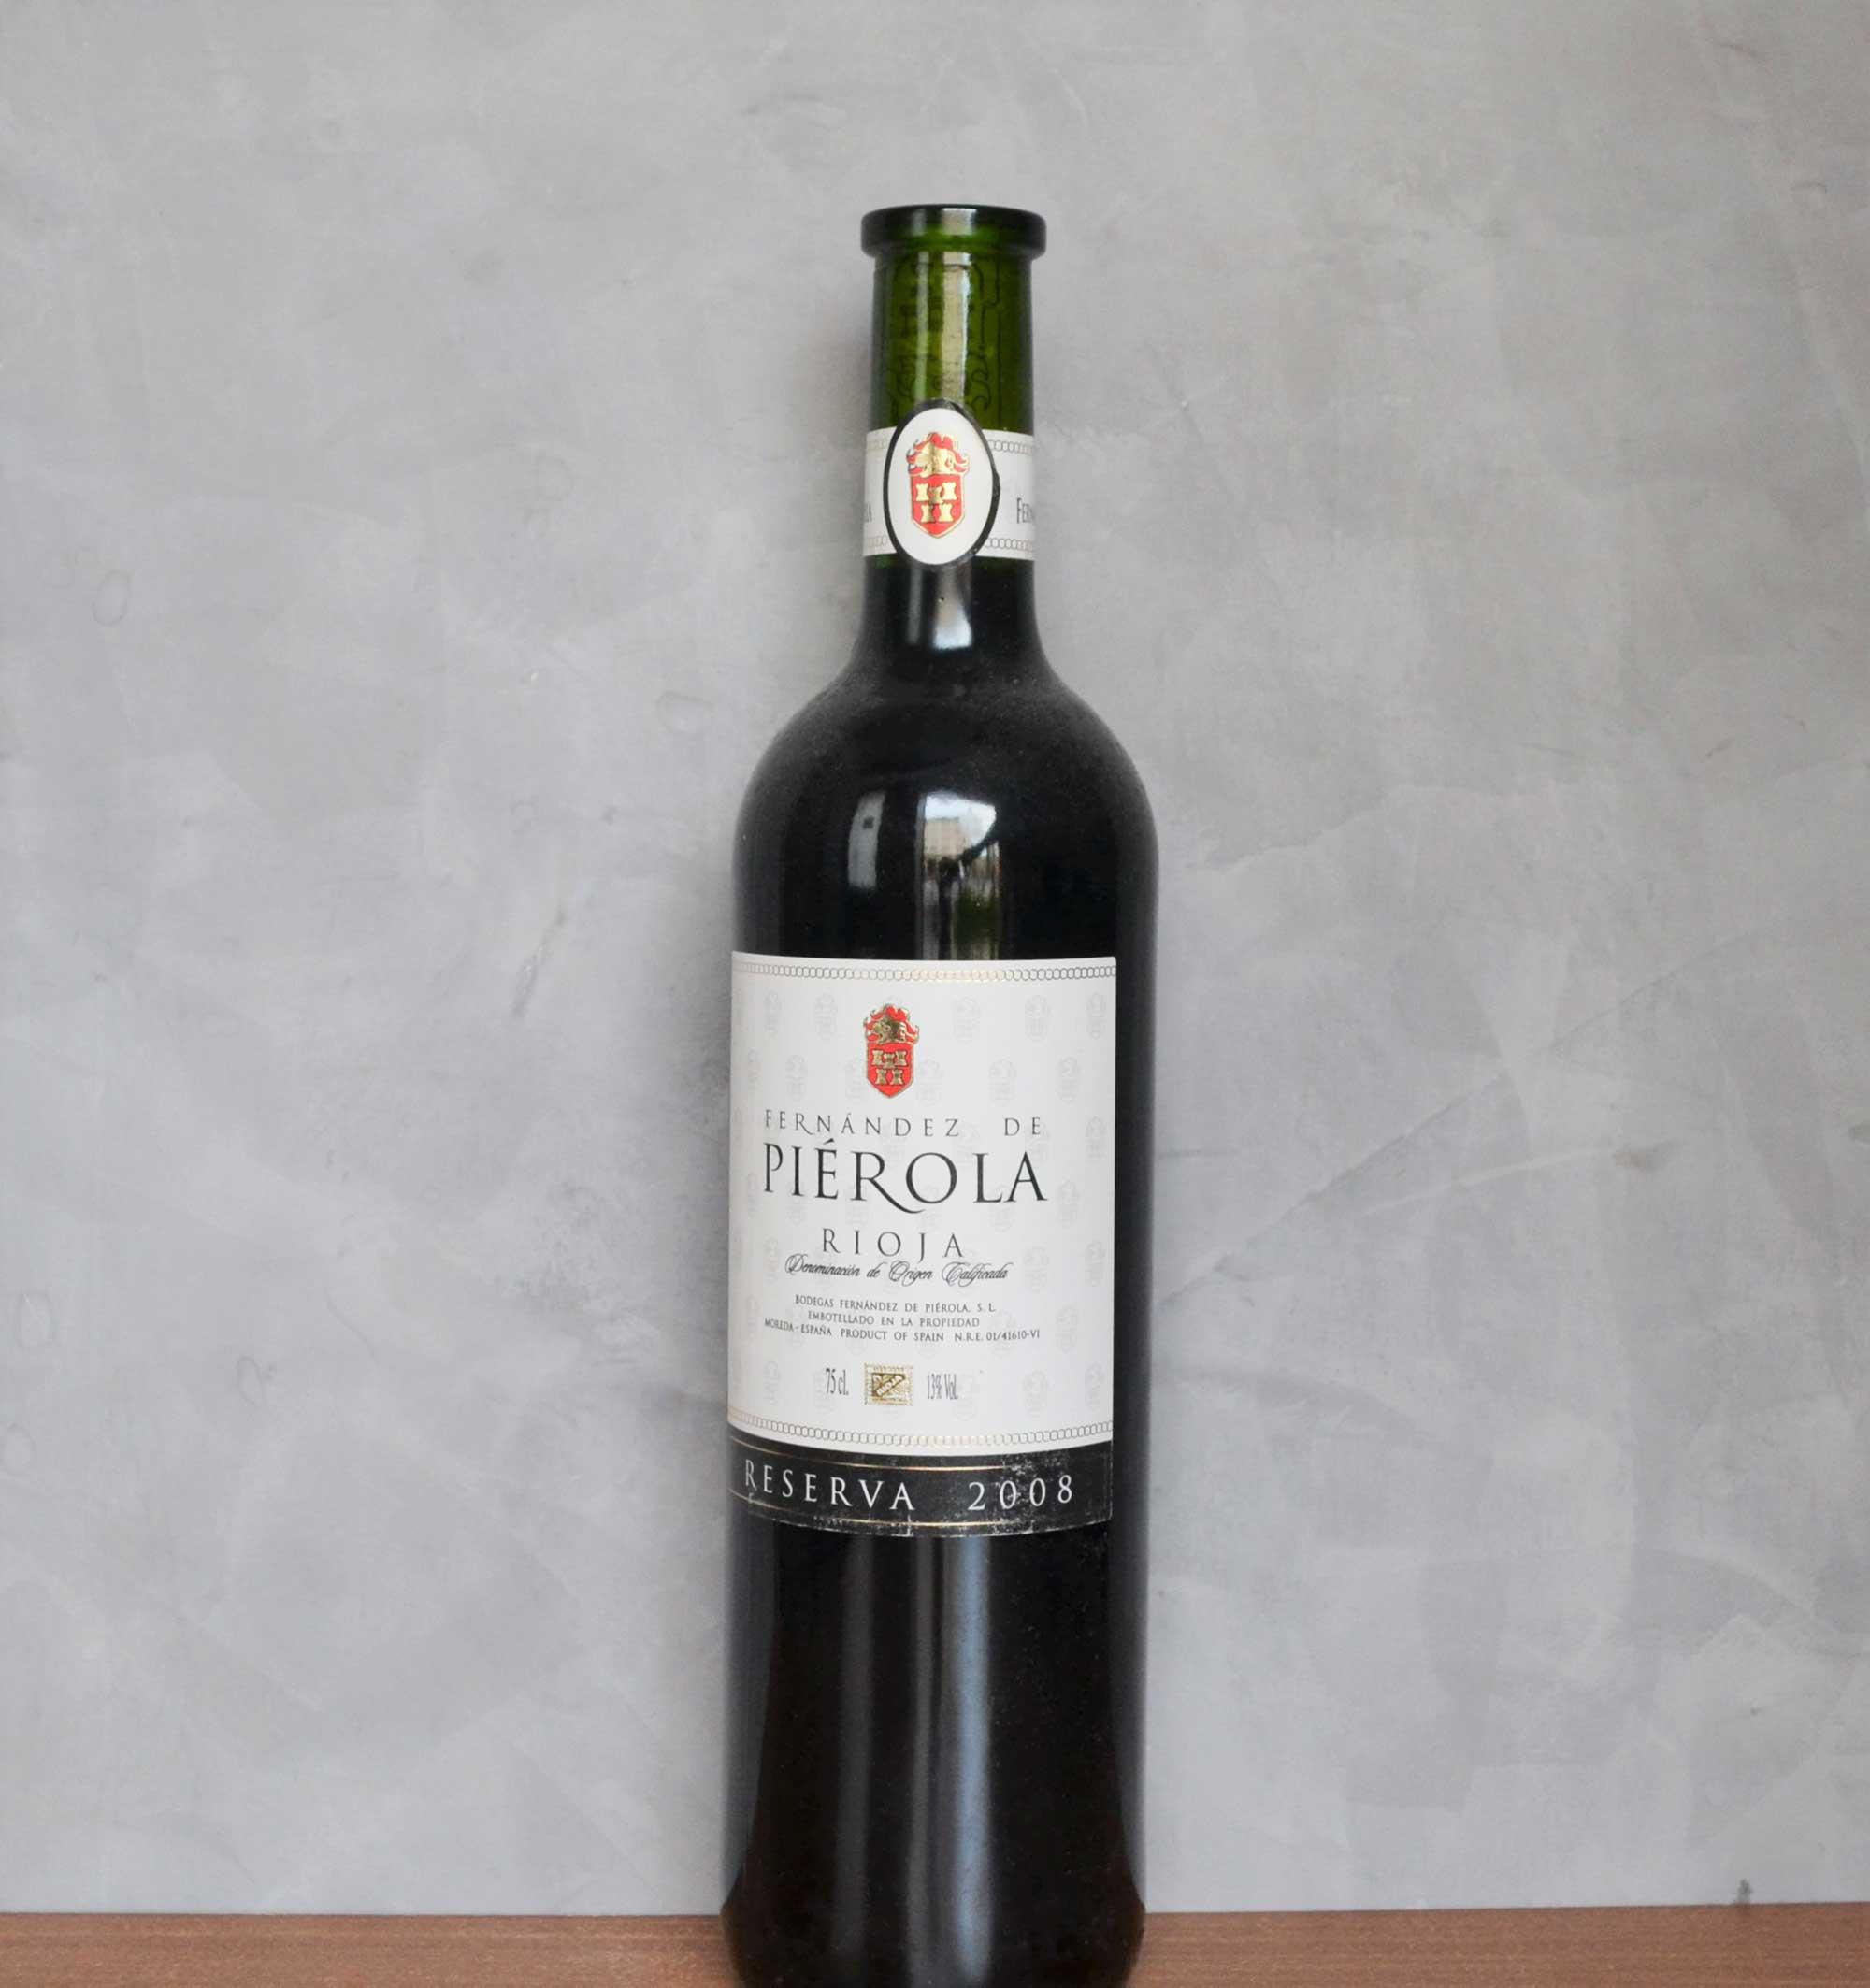 Pierola reserva 2008